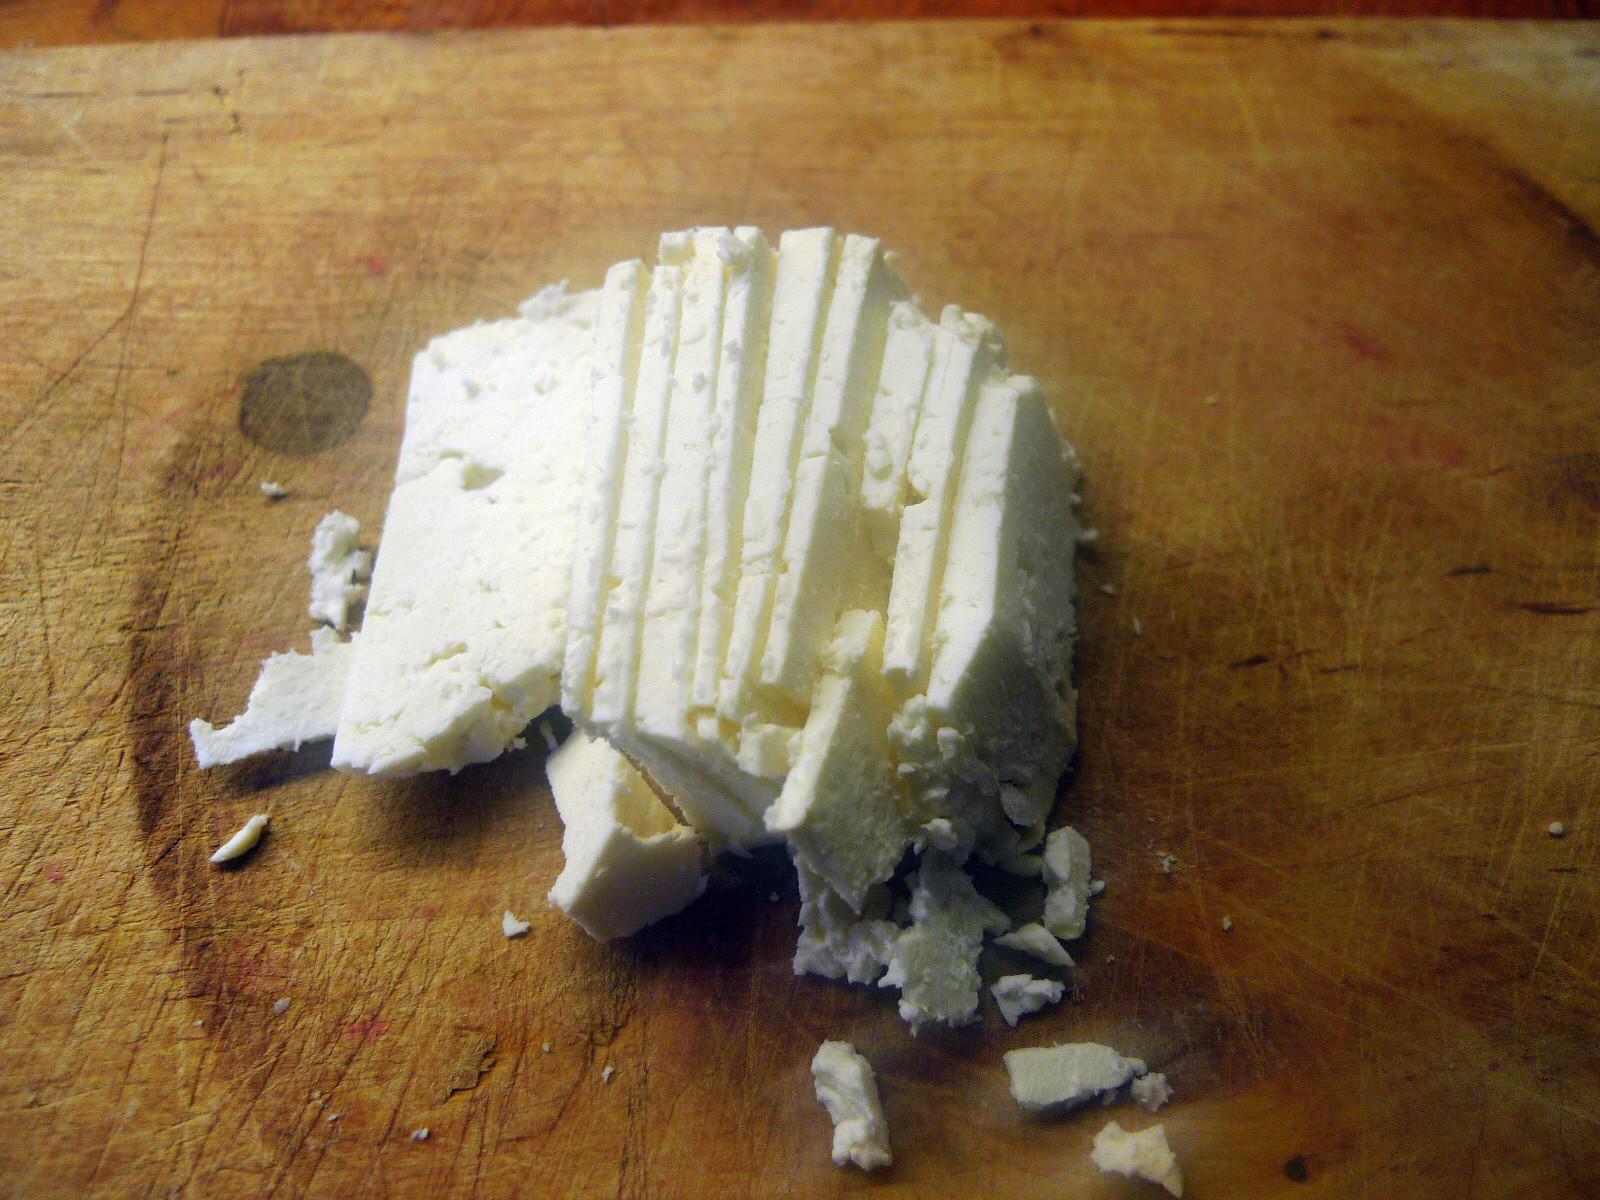 Ratatouille mit selbstgemachte Nudeln - 10.11.14   (10c)